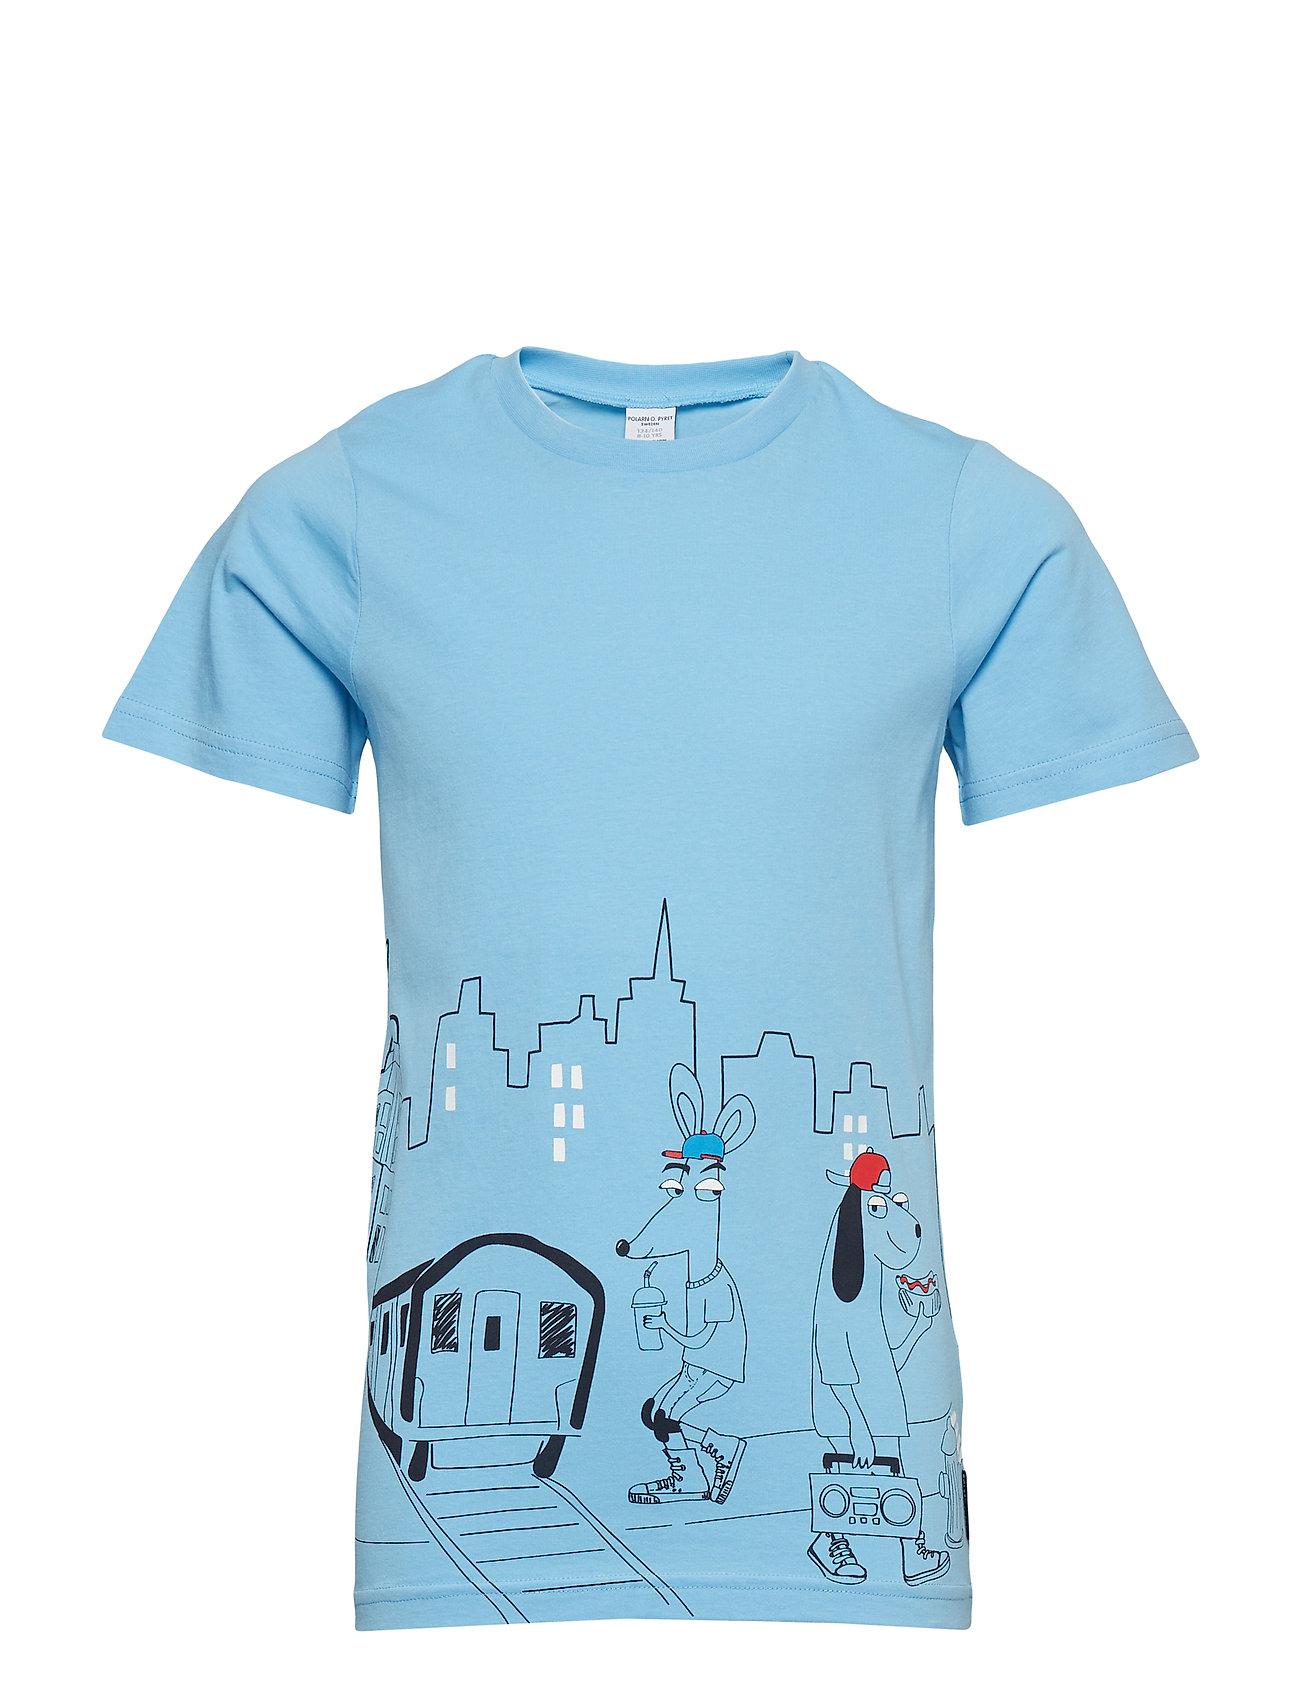 Polarn O. Pyret T-shirt Frontprint s/s School